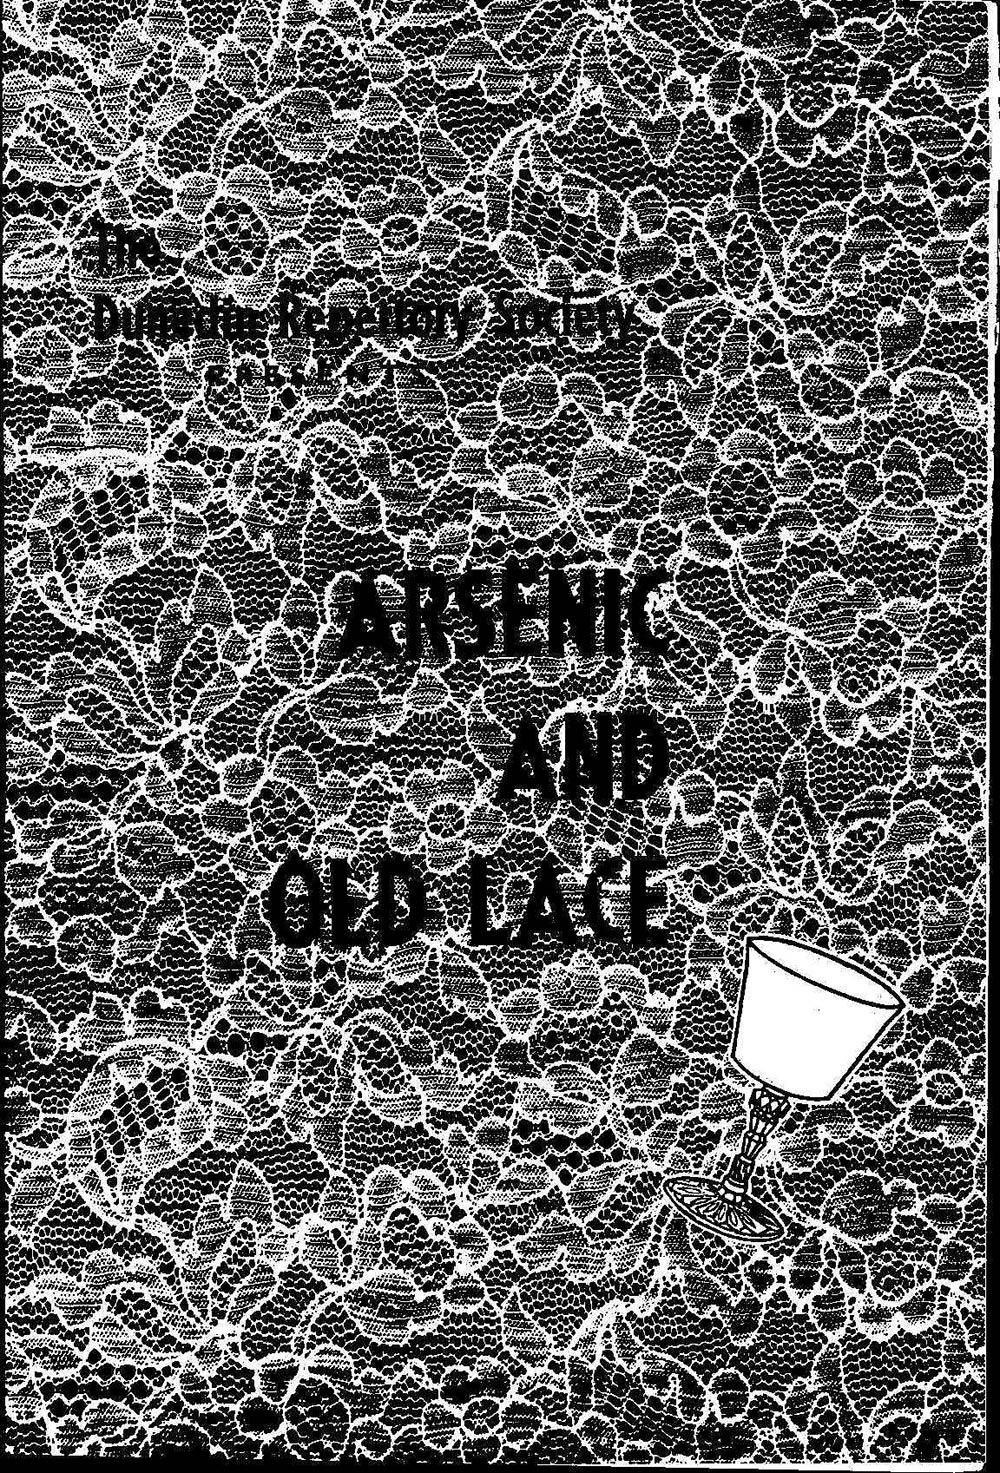 <em>Arsenic and old lace</em>. Joseph Kesselring. (Dunedin Repertory Society). [ca. 1960]